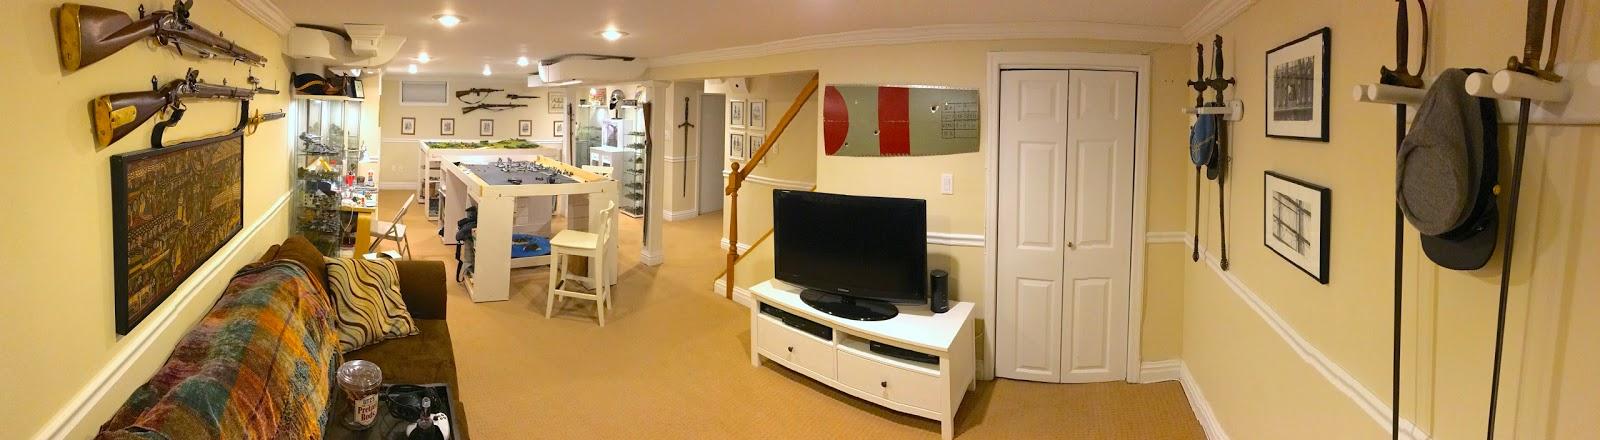 the+room.JPG